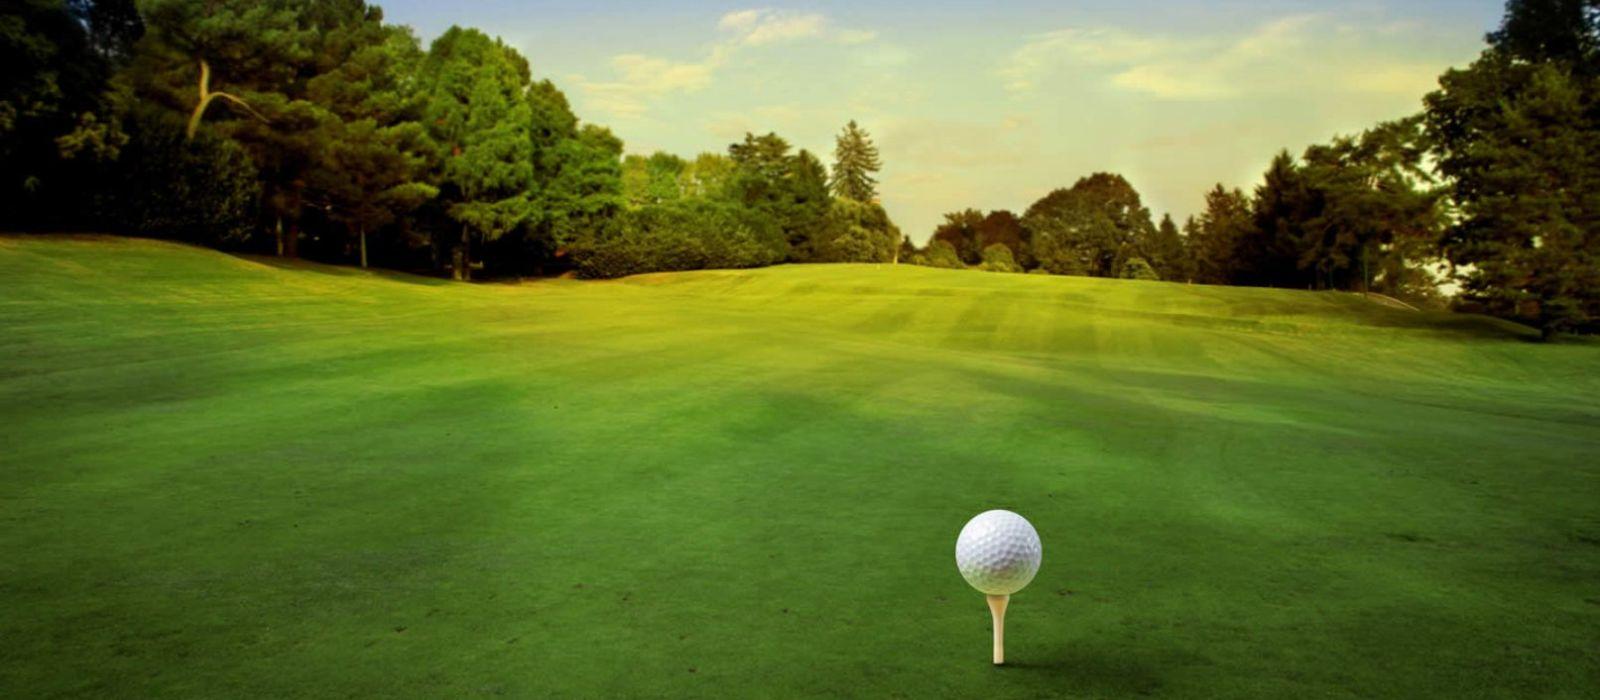 Golf Course at Bracken Hotel, Balbriggan Dublin Ireland